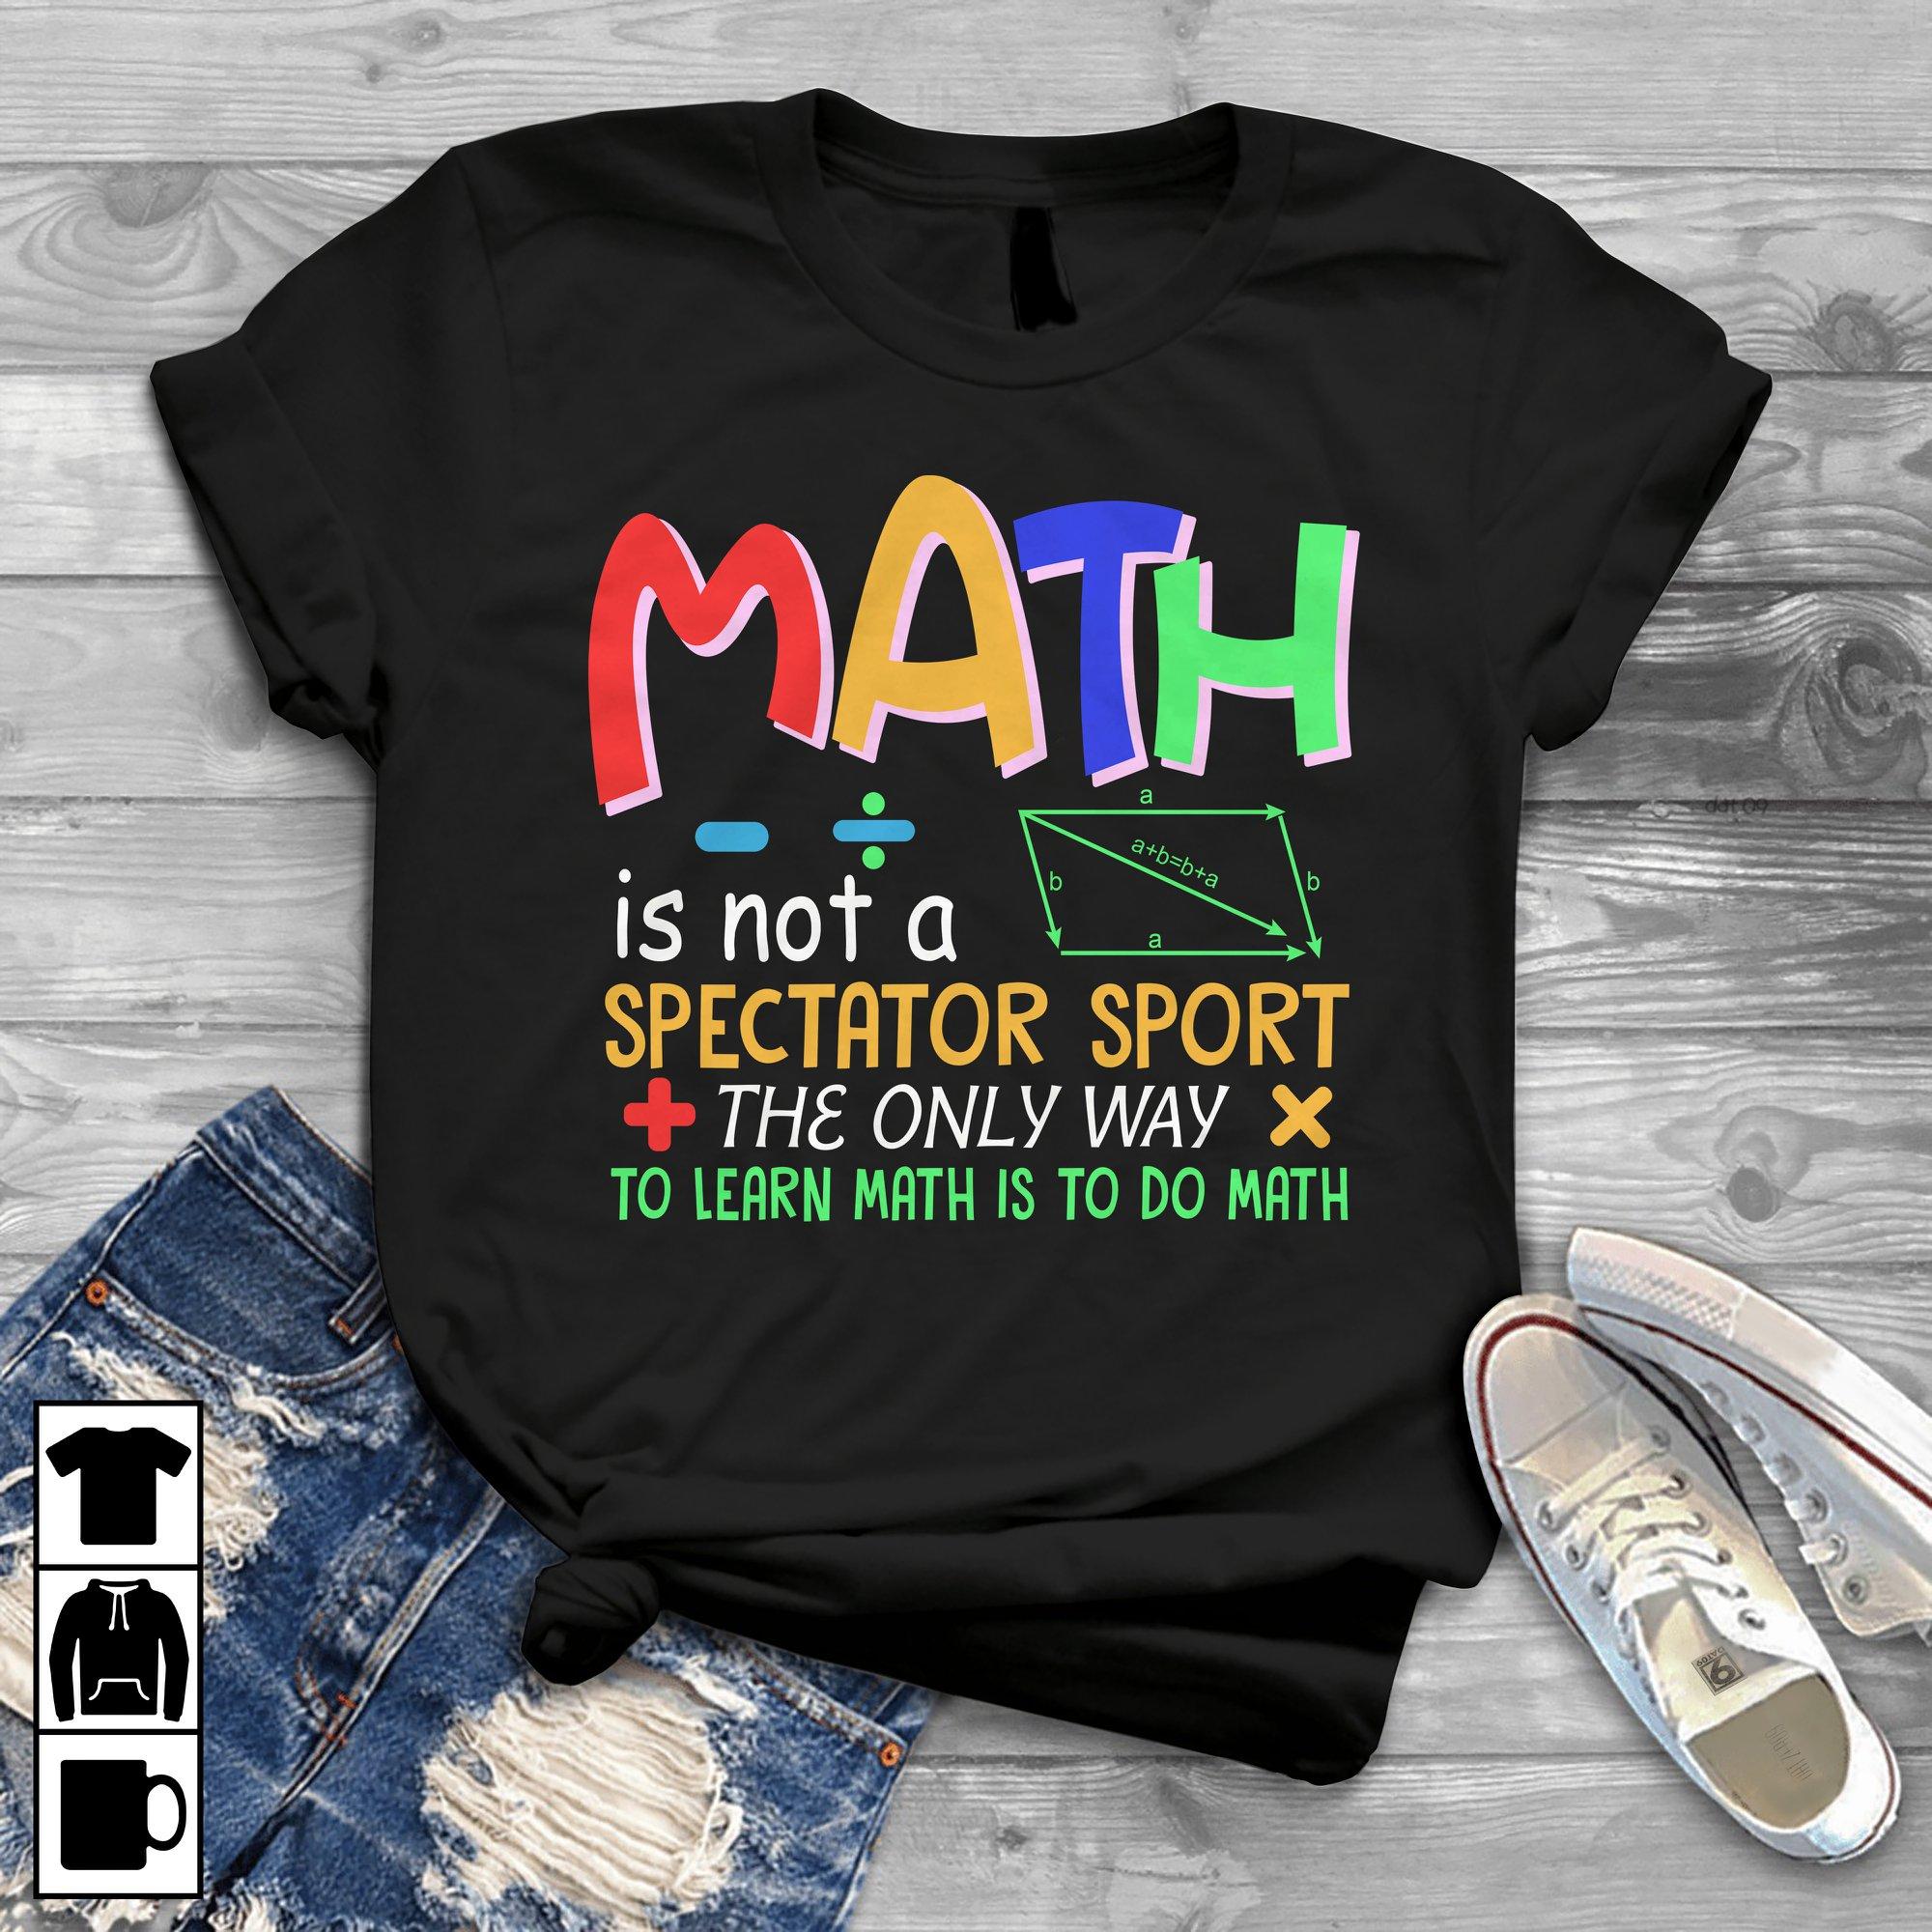 Math Teacher Shirt The Only Way To Learn Math Is To Do Math